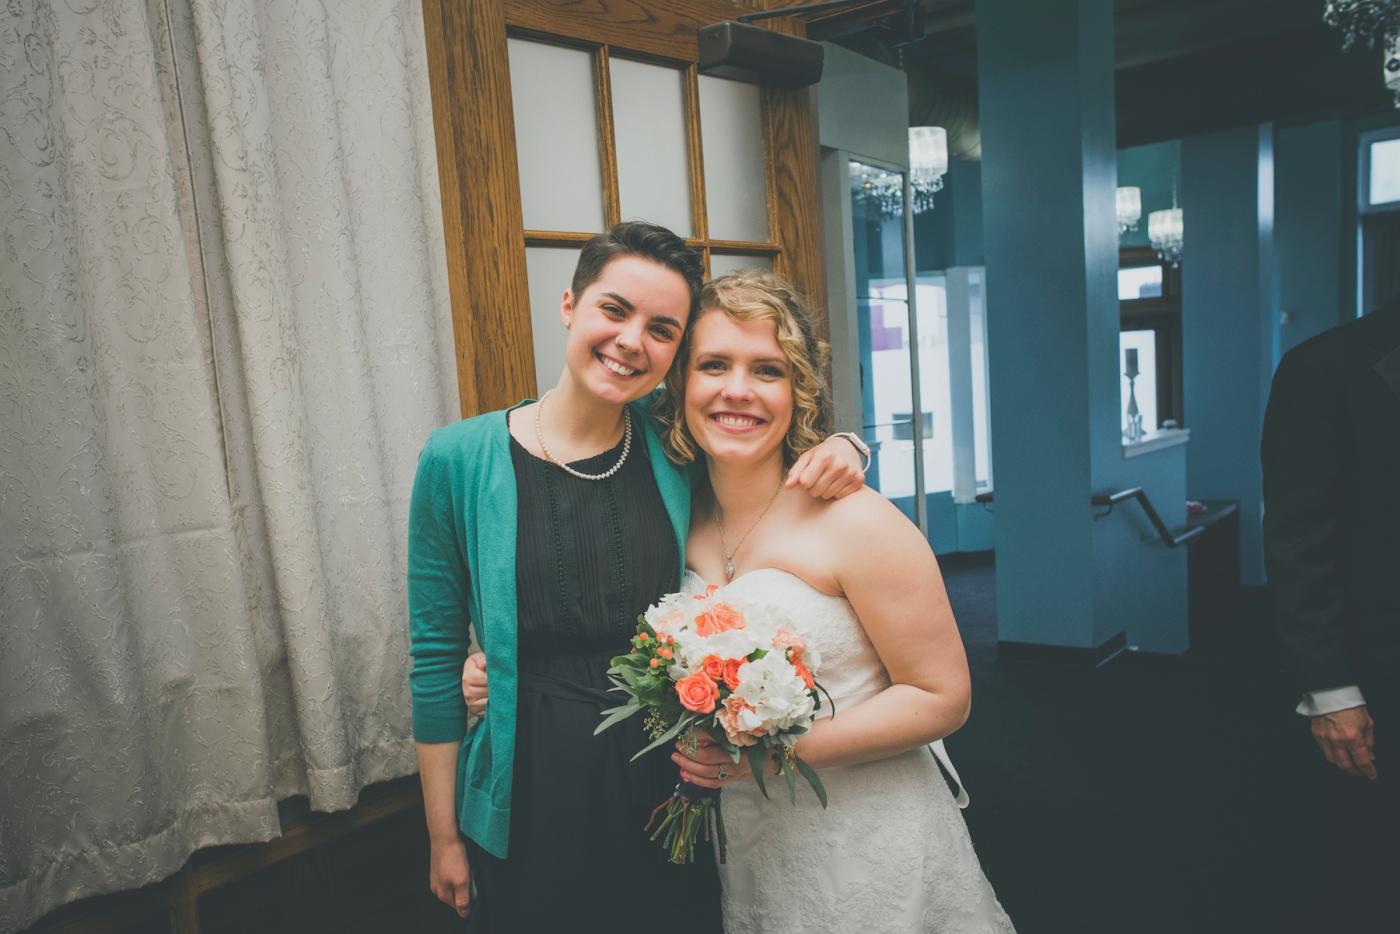 DSC_3042Everett_Wedding_Ballroom_Jane_Speleers_photography_Rachel_and_Edmund_reception_2017